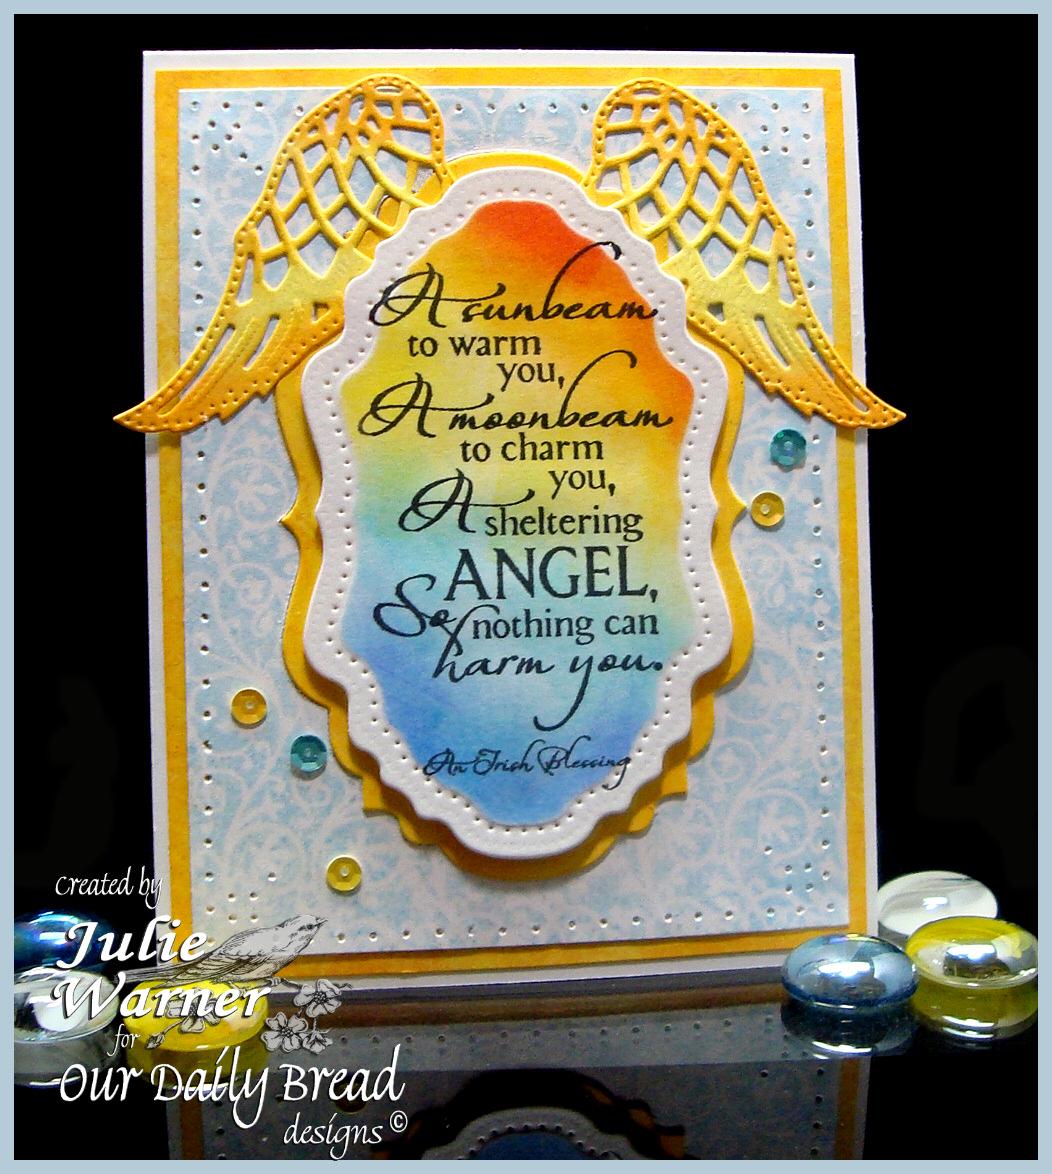 Stamps - Our Daily Bread Designs Chalkboard Vine Background, Sheltering Angel, ODBD Custom Angel Wings Die, ODBD Custom Vintage Labels Die, ODBD Custom Vintage Flourish Pattern Die